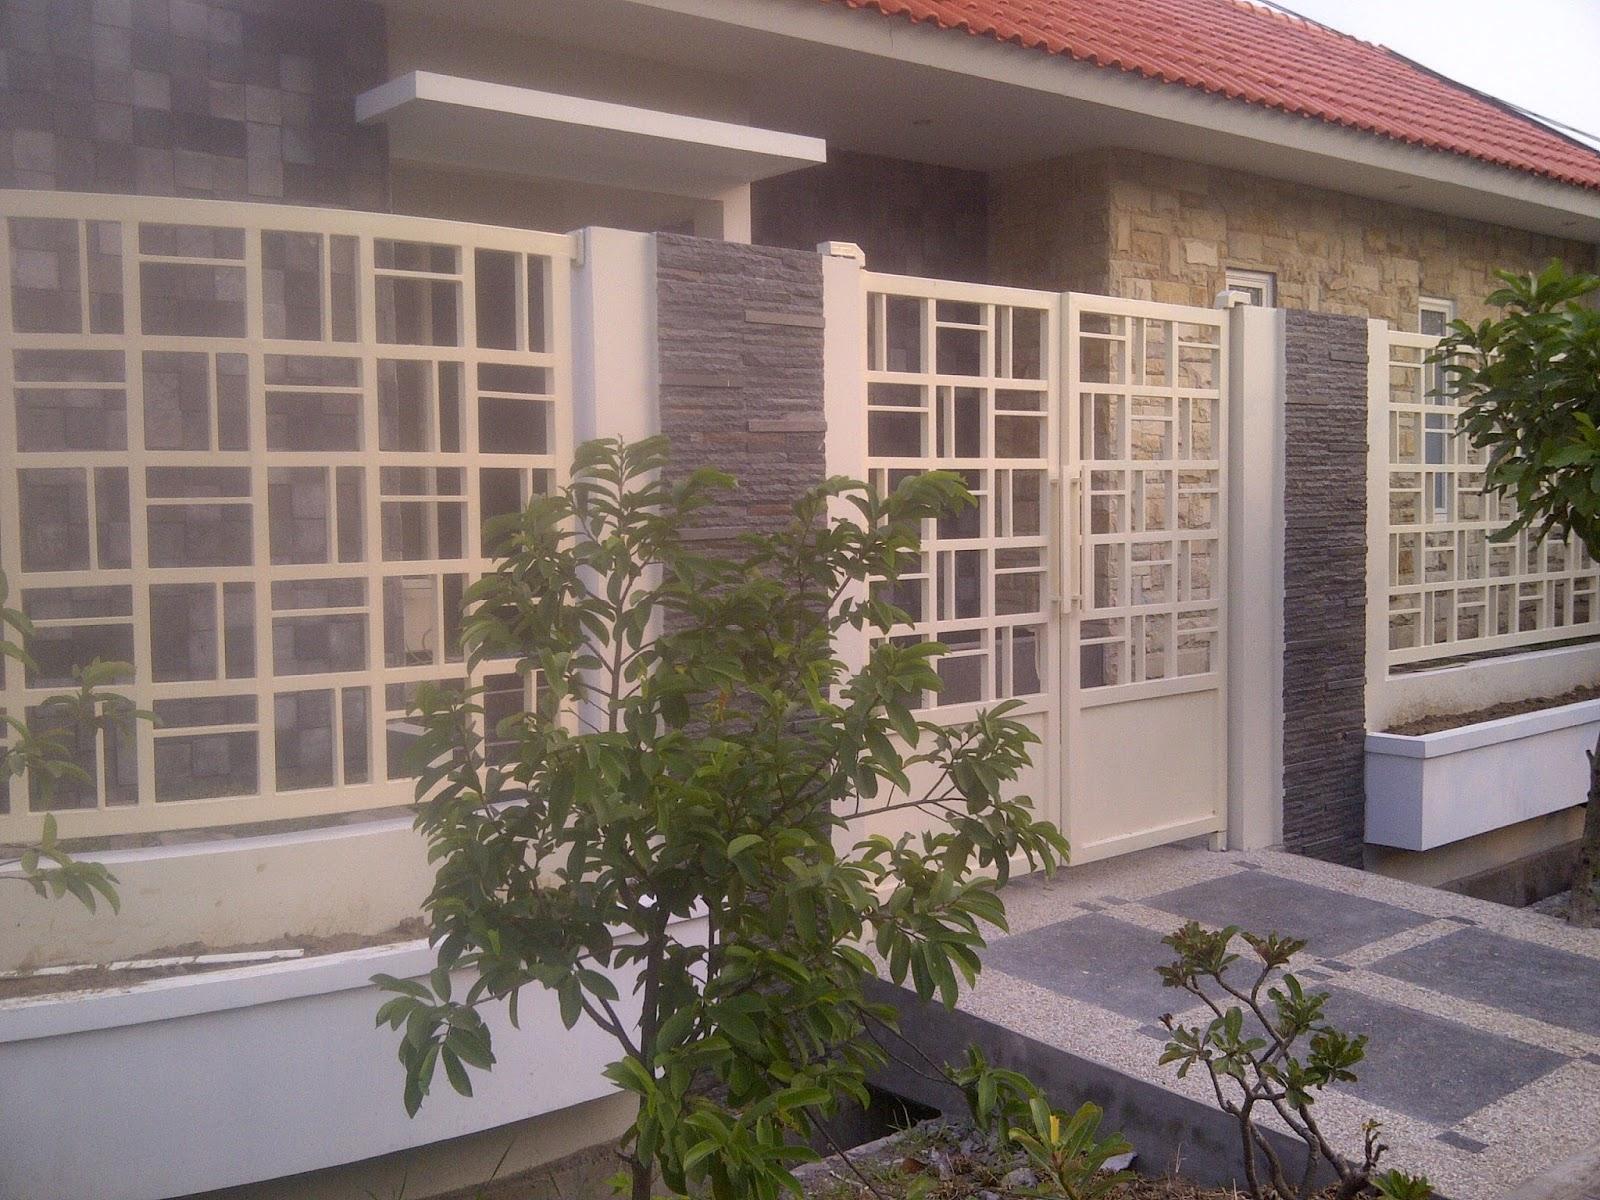 railing tangga modern minimalis eksterior rumah minimalis